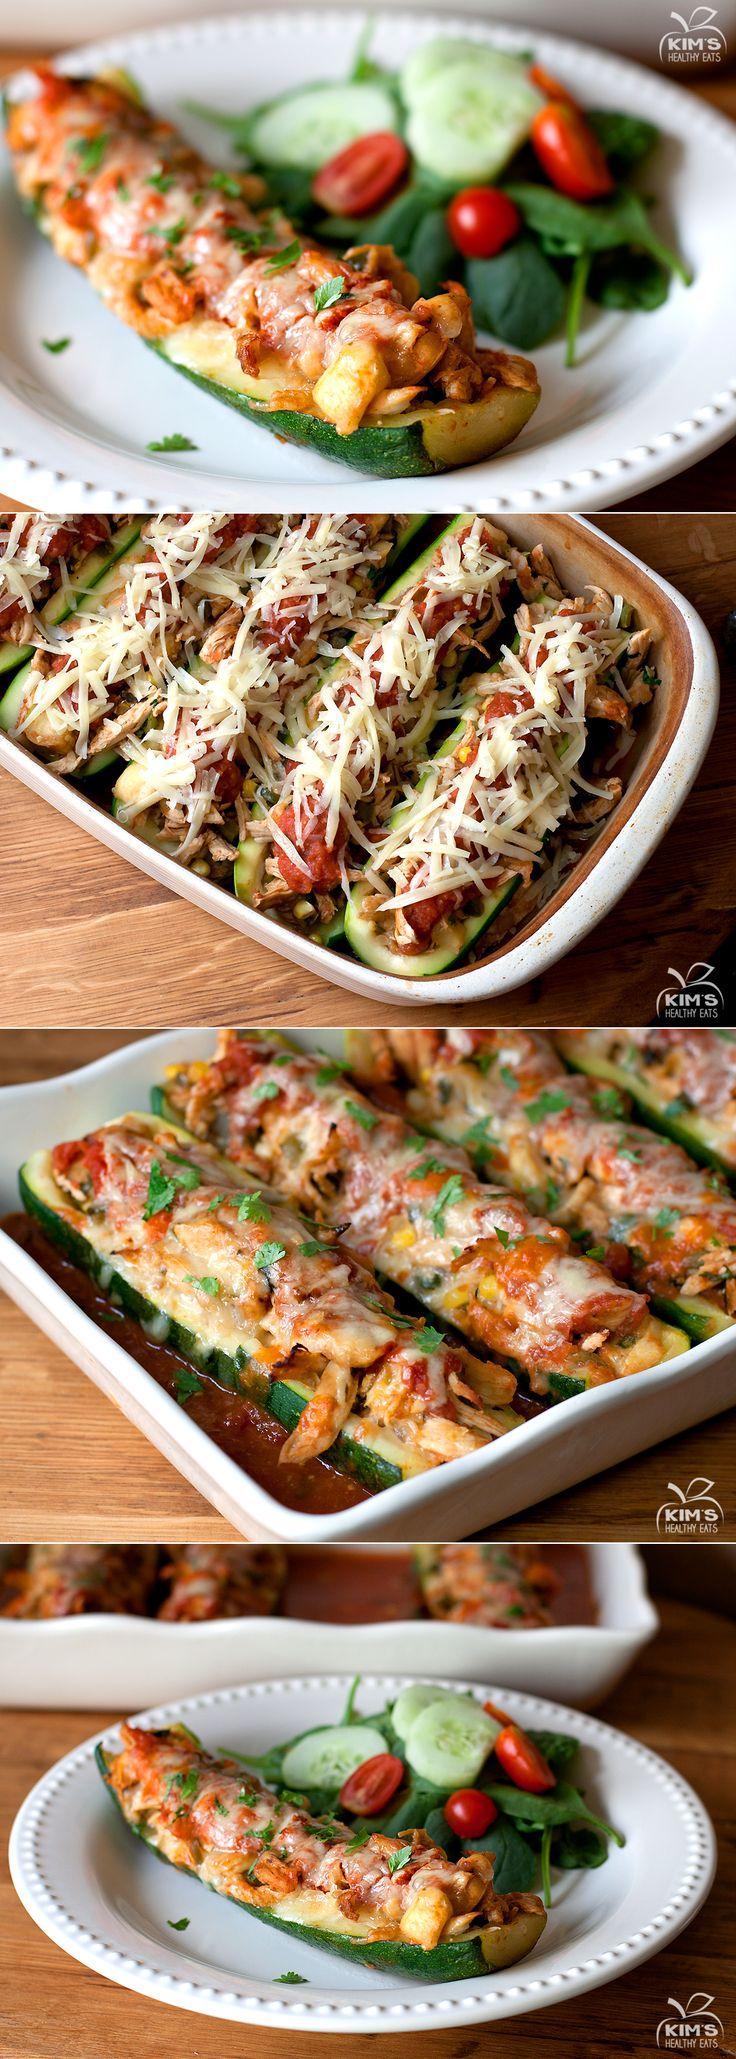 Chicken Enchilada Zucchini Boats. YES